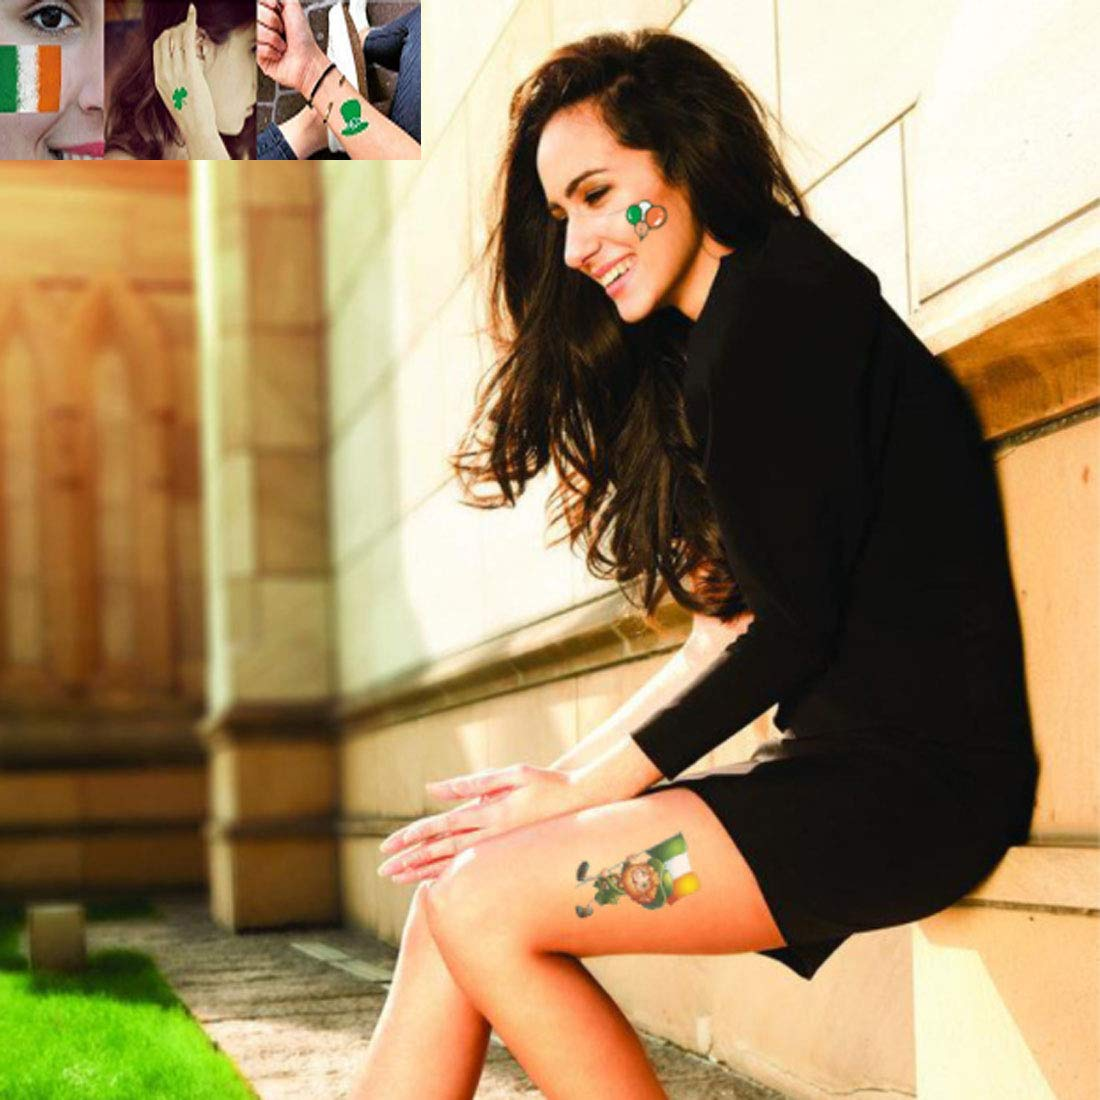 Patricks Day Tattoo Sticker Fits for Shamrock Tattoos Party Favors LOVEIFE St Teacher Prizes Classroom Party Irish Gift Ireland BAR 72 Species 10 Sheet